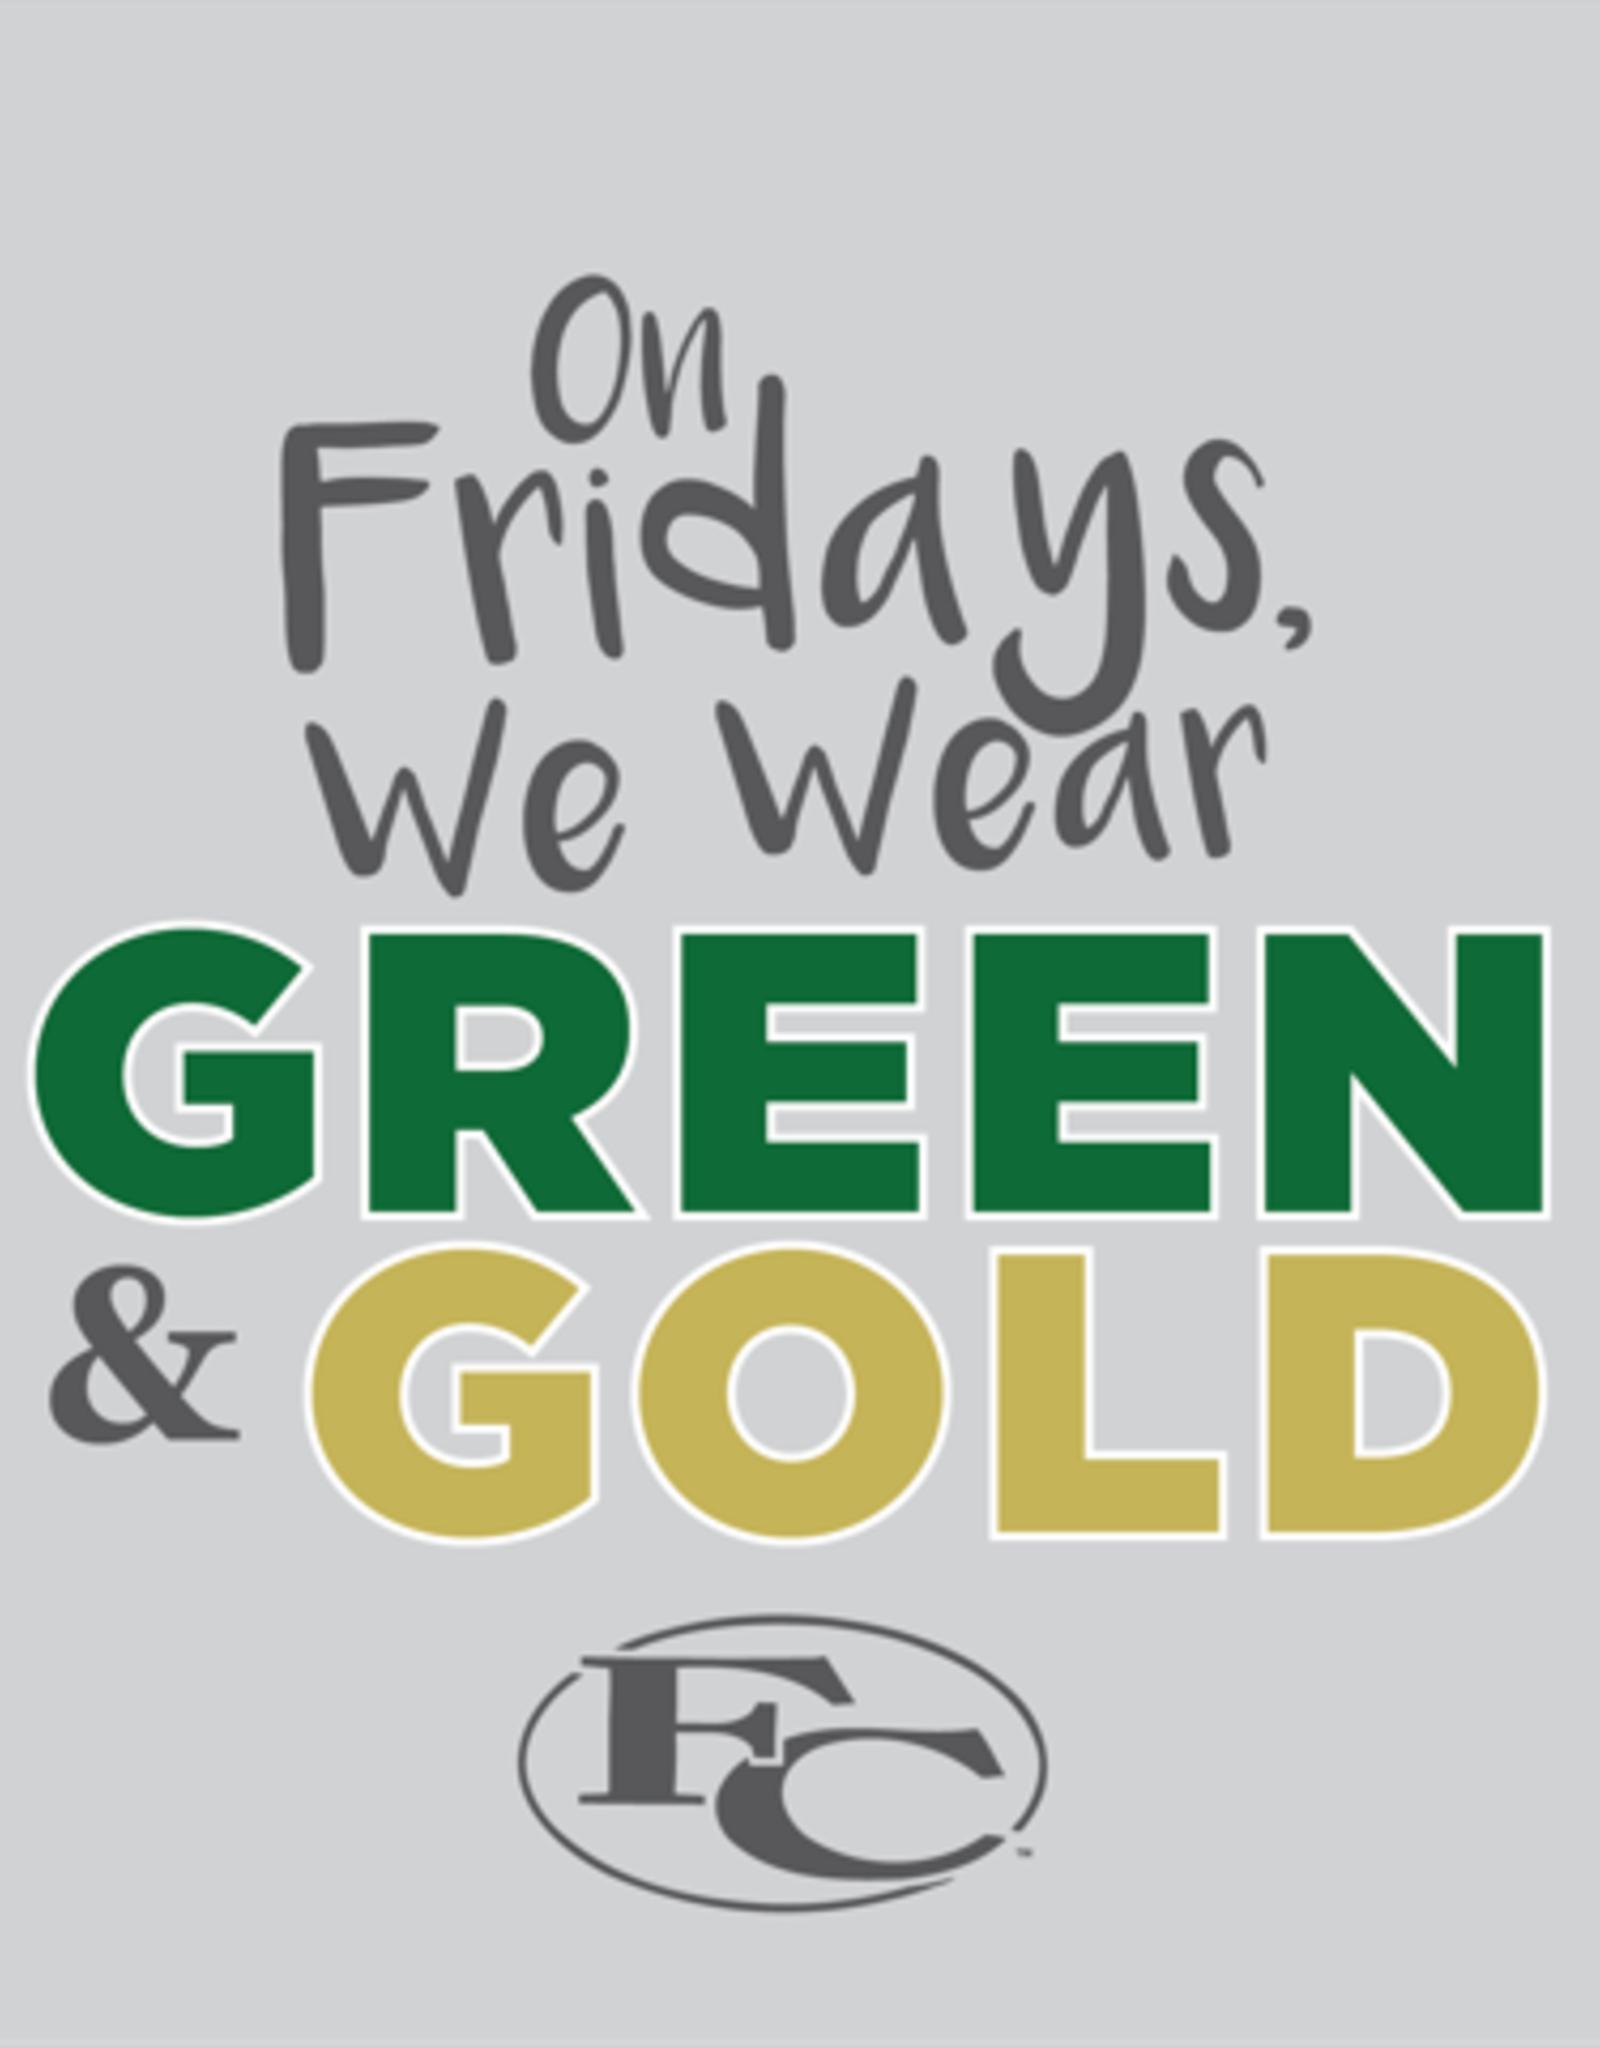 SW 21 Green on Fridays